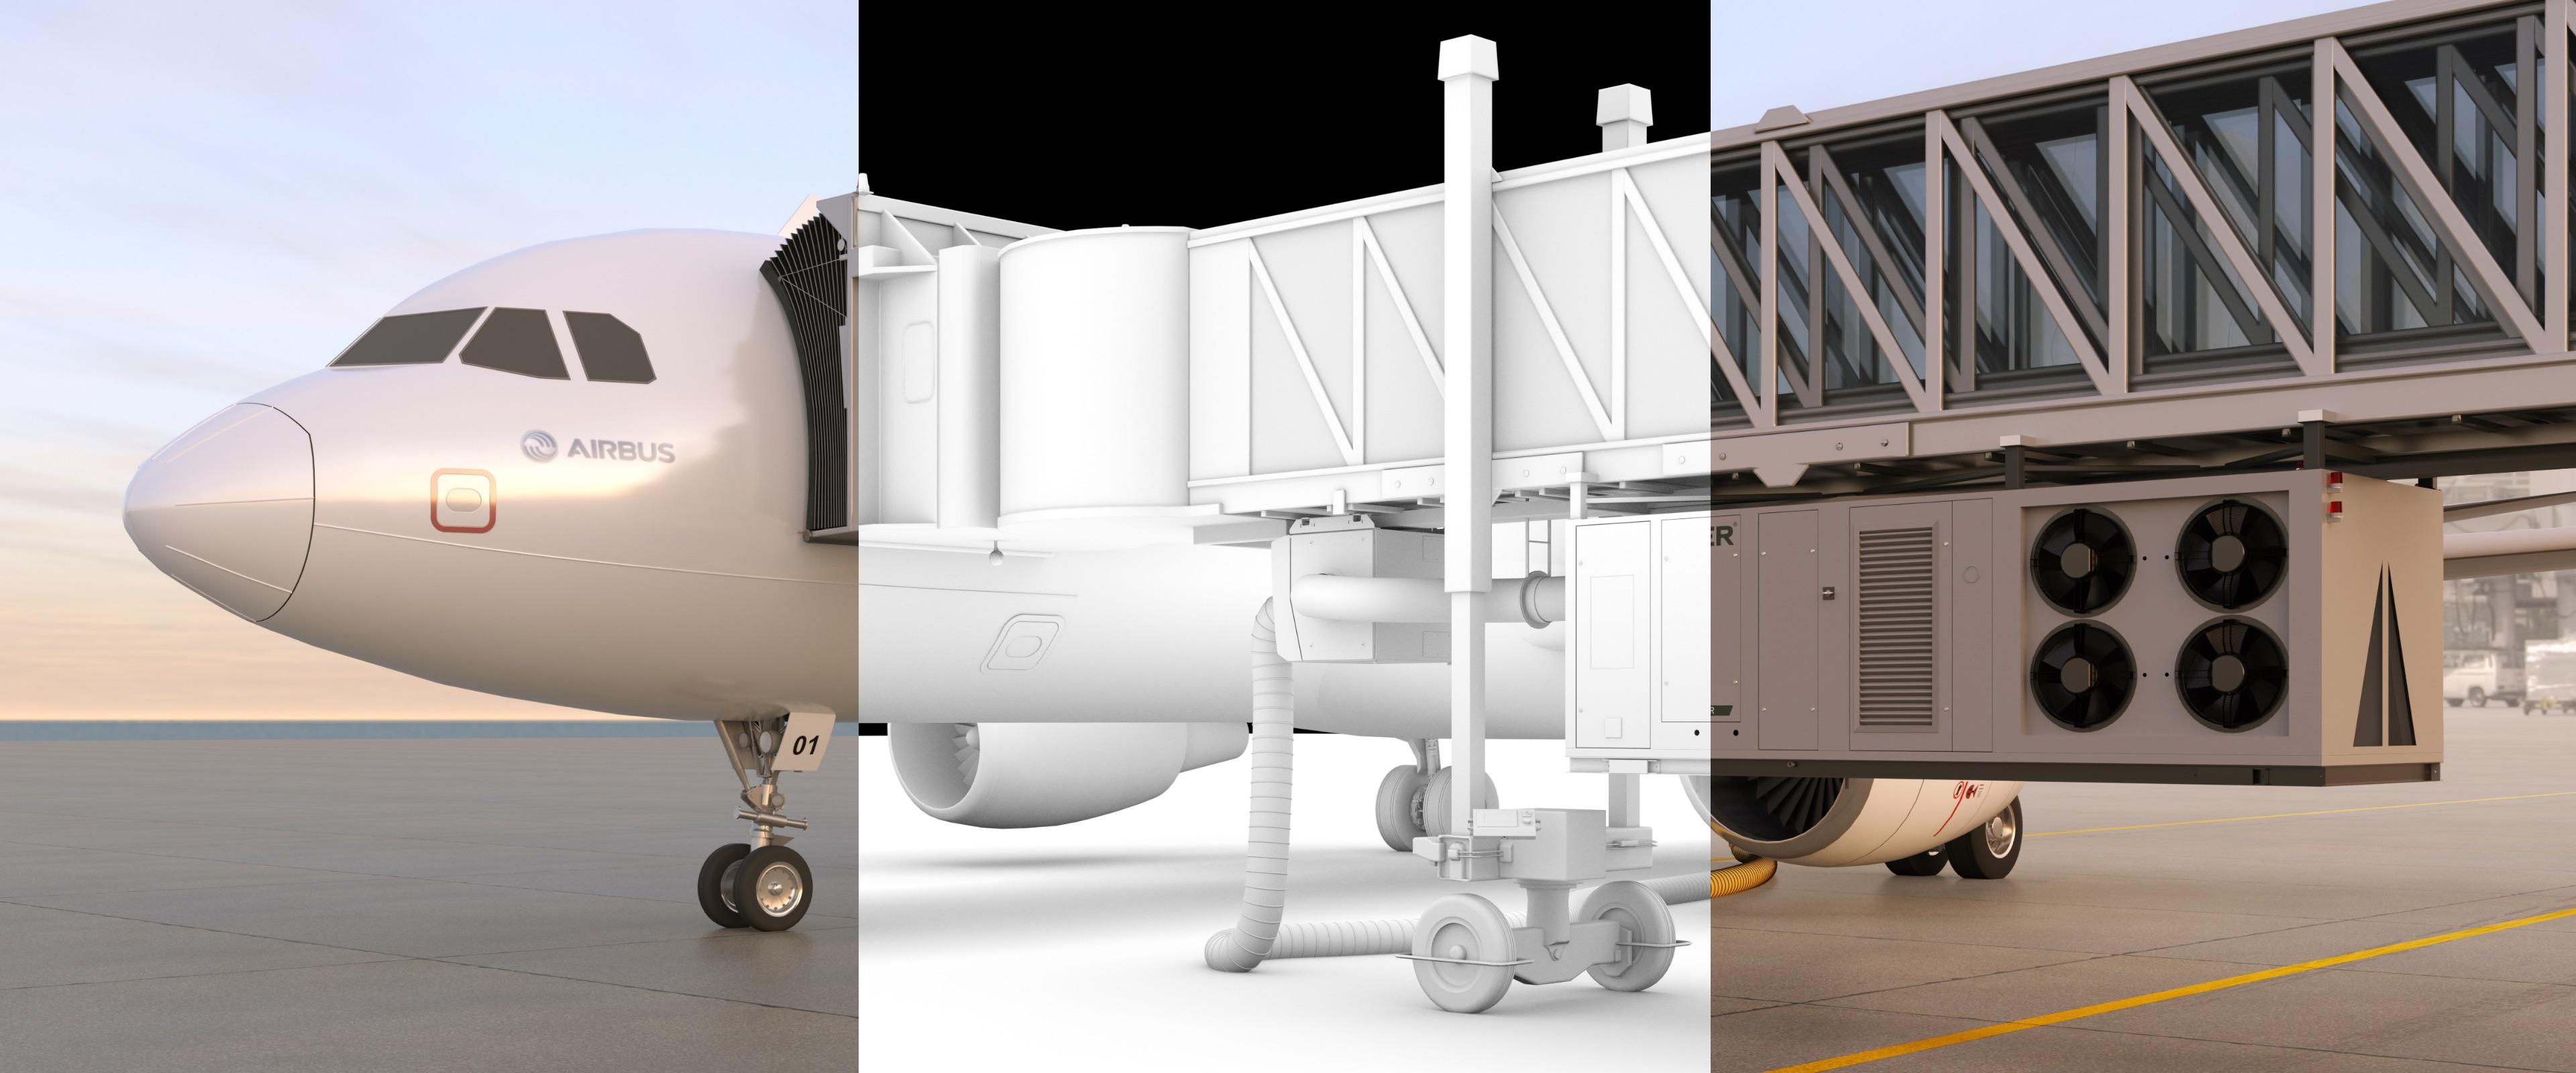 Q2 Werbeagentur, Hitzinger, 3D-Visualisierung